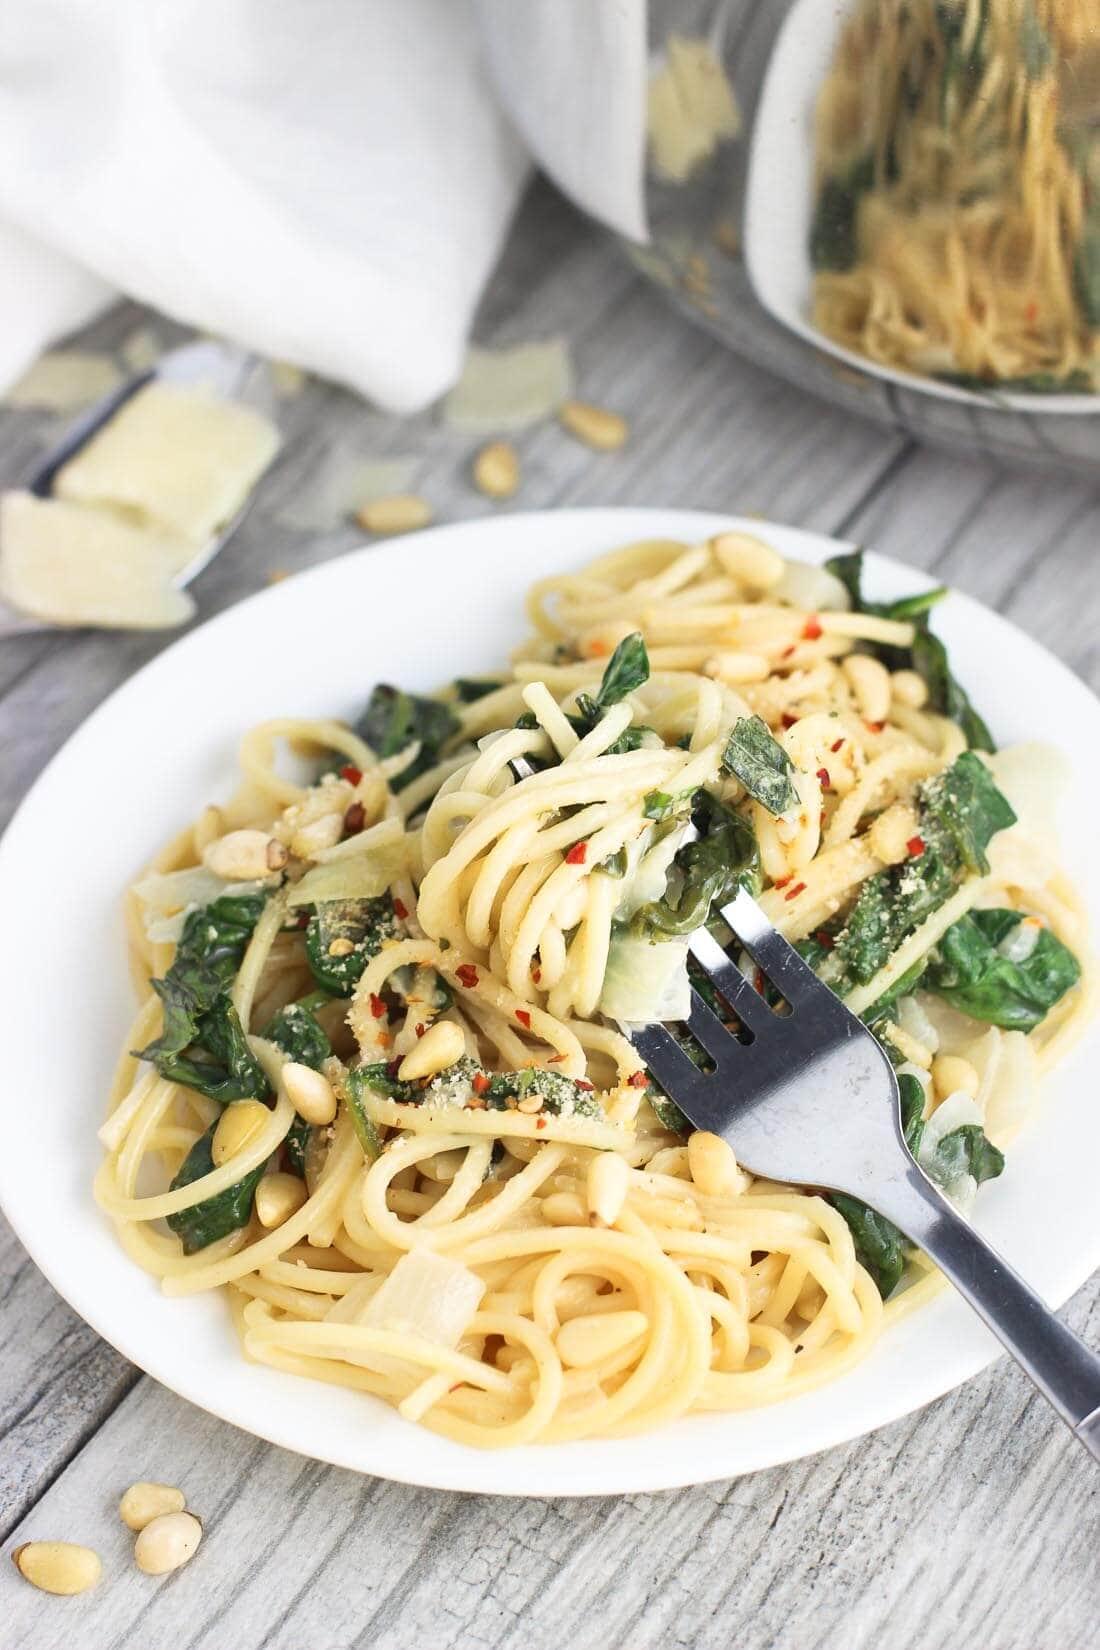 Creamy Lemon Spinach One-Pot Pasta by mysequinedlife.com